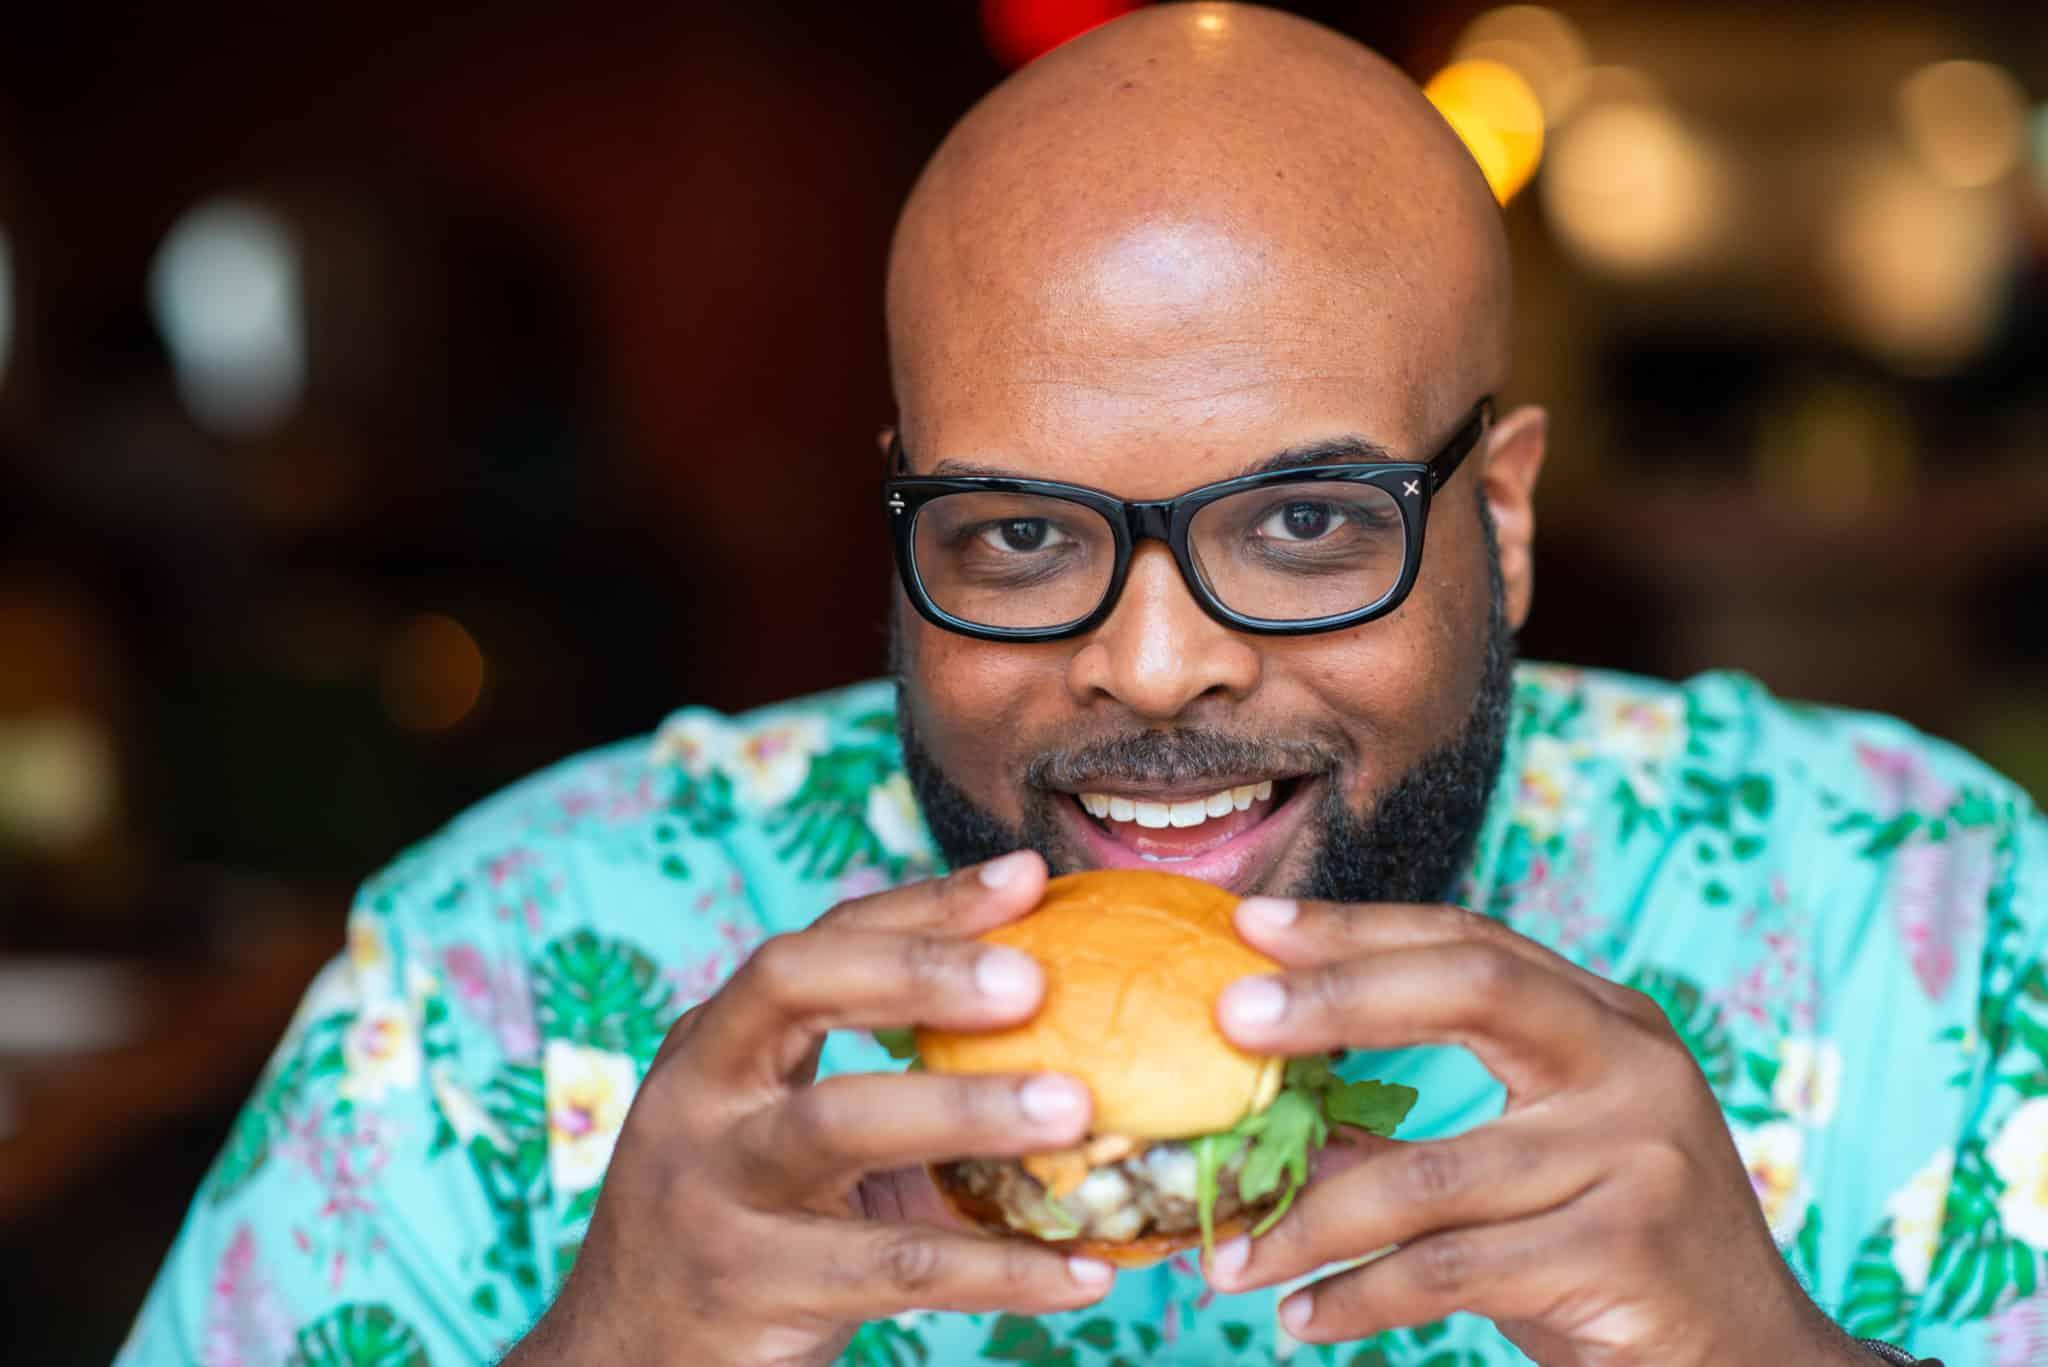 Amos Cooper Jr. eating a burger at Alley Twenty Six